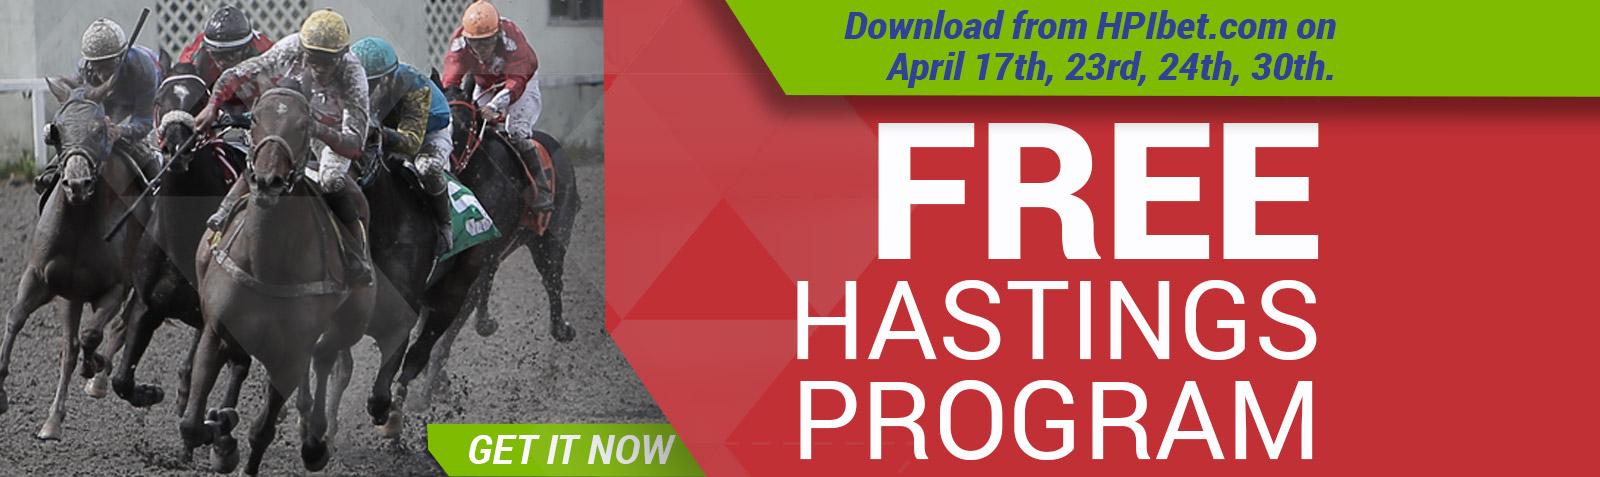 HPI16-059-HPI-Free-Program-Rev-Slider